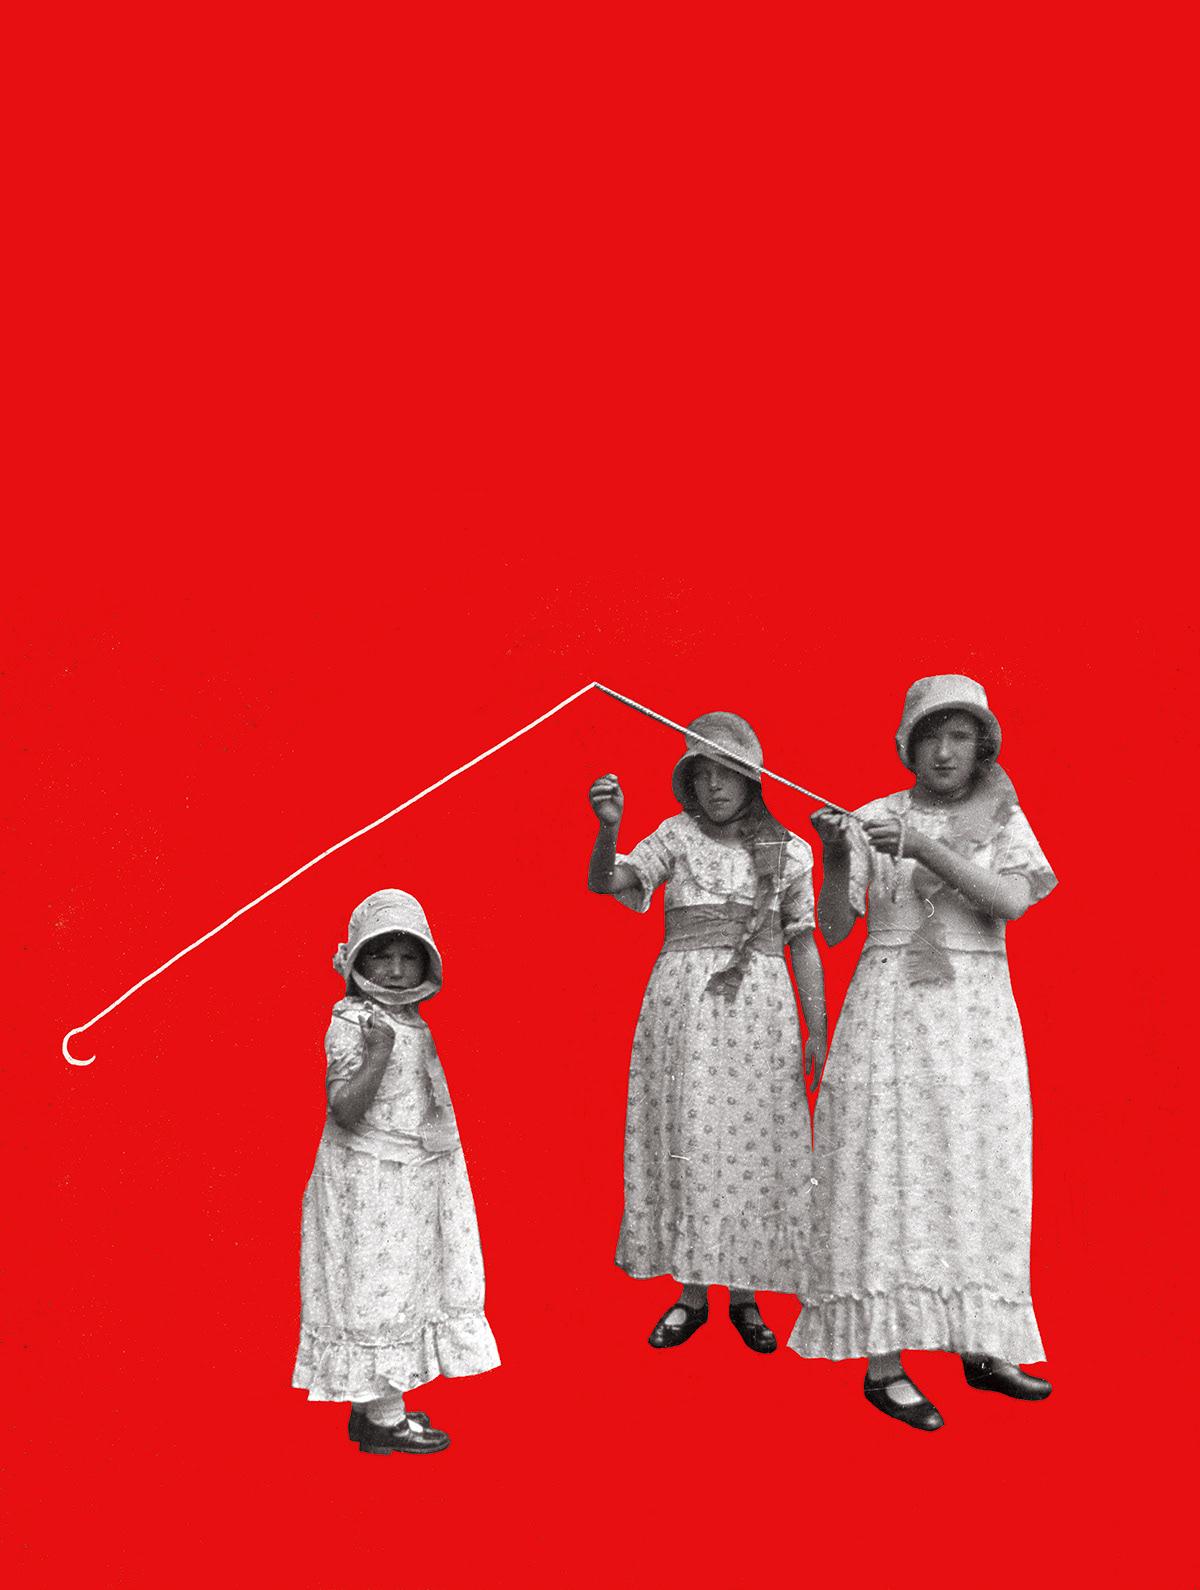 ilustracja Theatre collage kolaz graphicdesign design ILLUSTRATION  red woman book